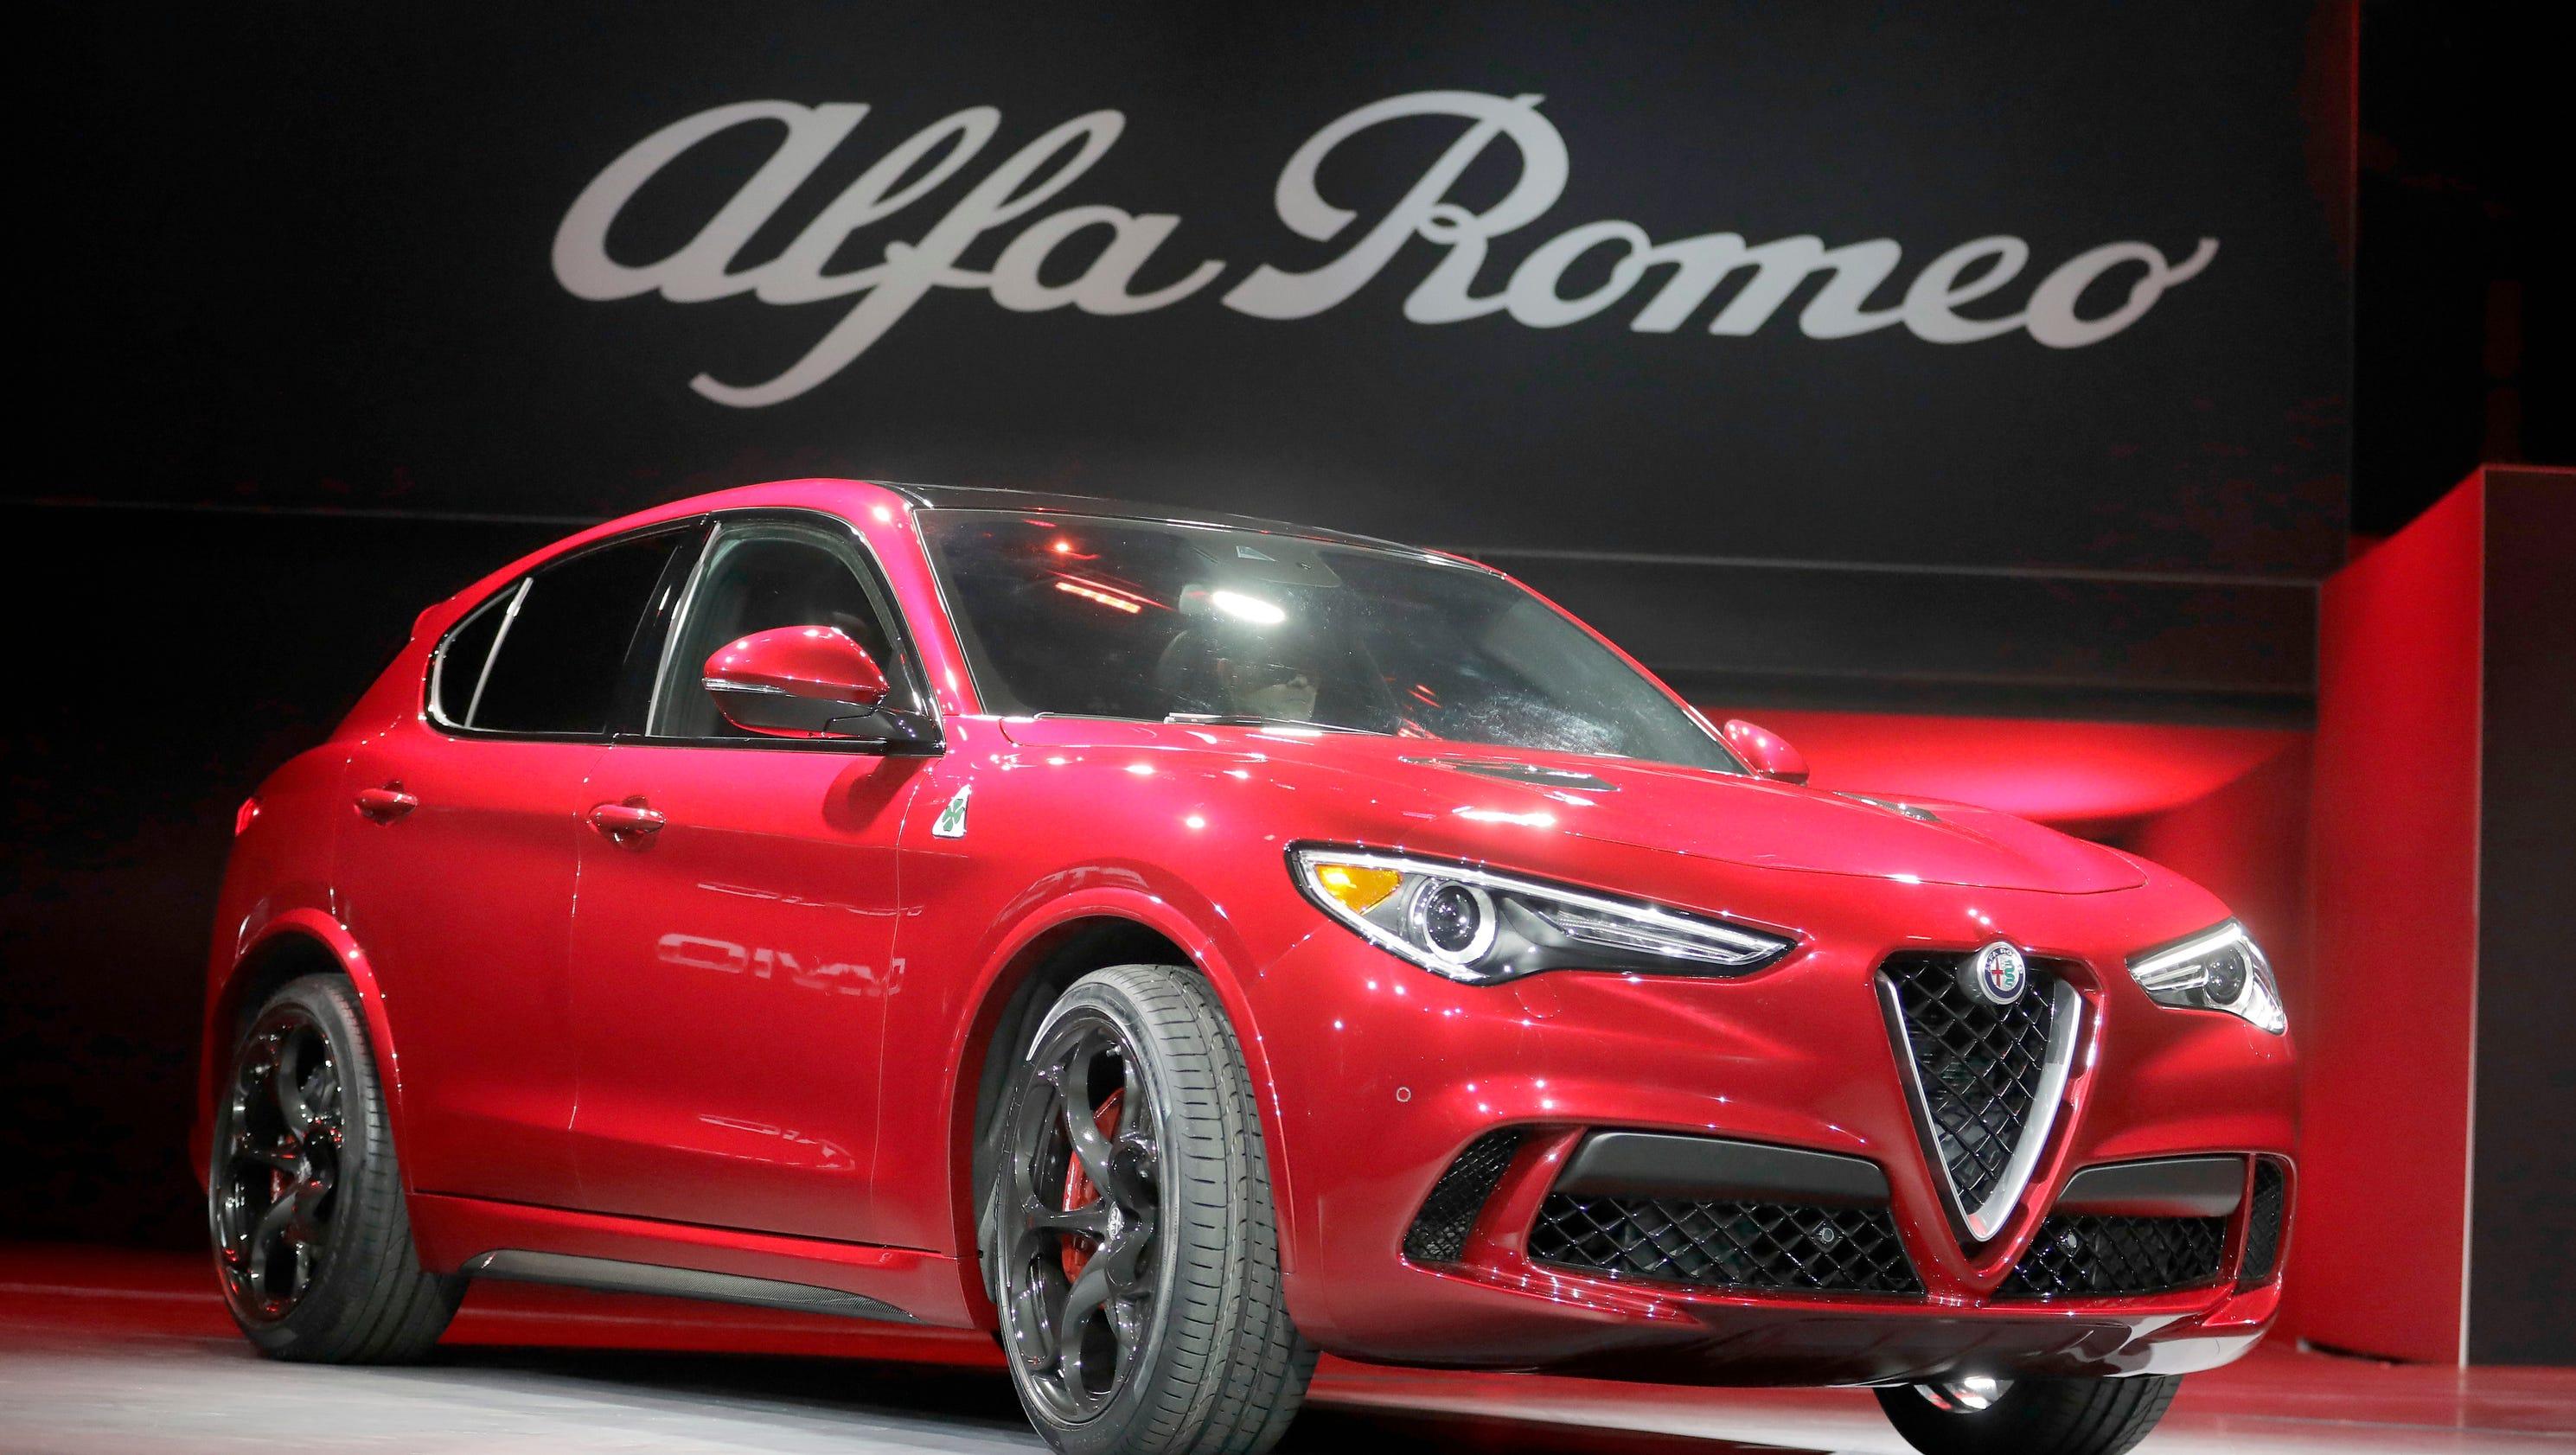 Los Angeles Auto Show Hits Misses